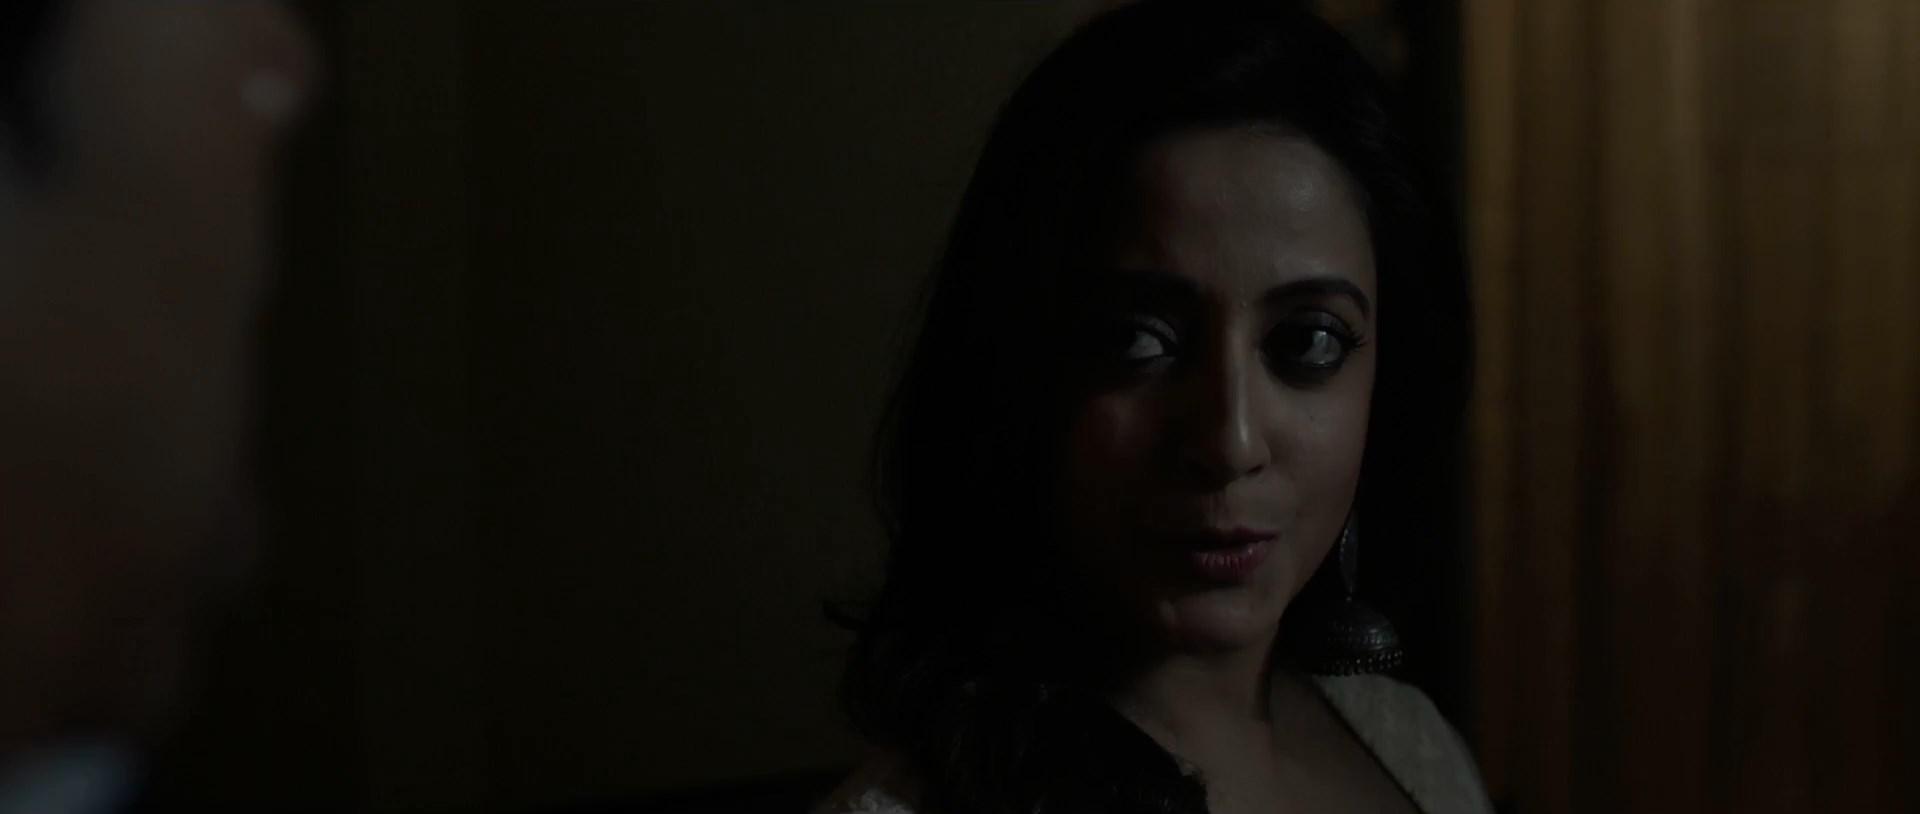 KAYA The Mystery Unfolds 2021 Bengali Movie 1080p WEB DL x264 AAC.mp4 snapshot 01.51.15.250